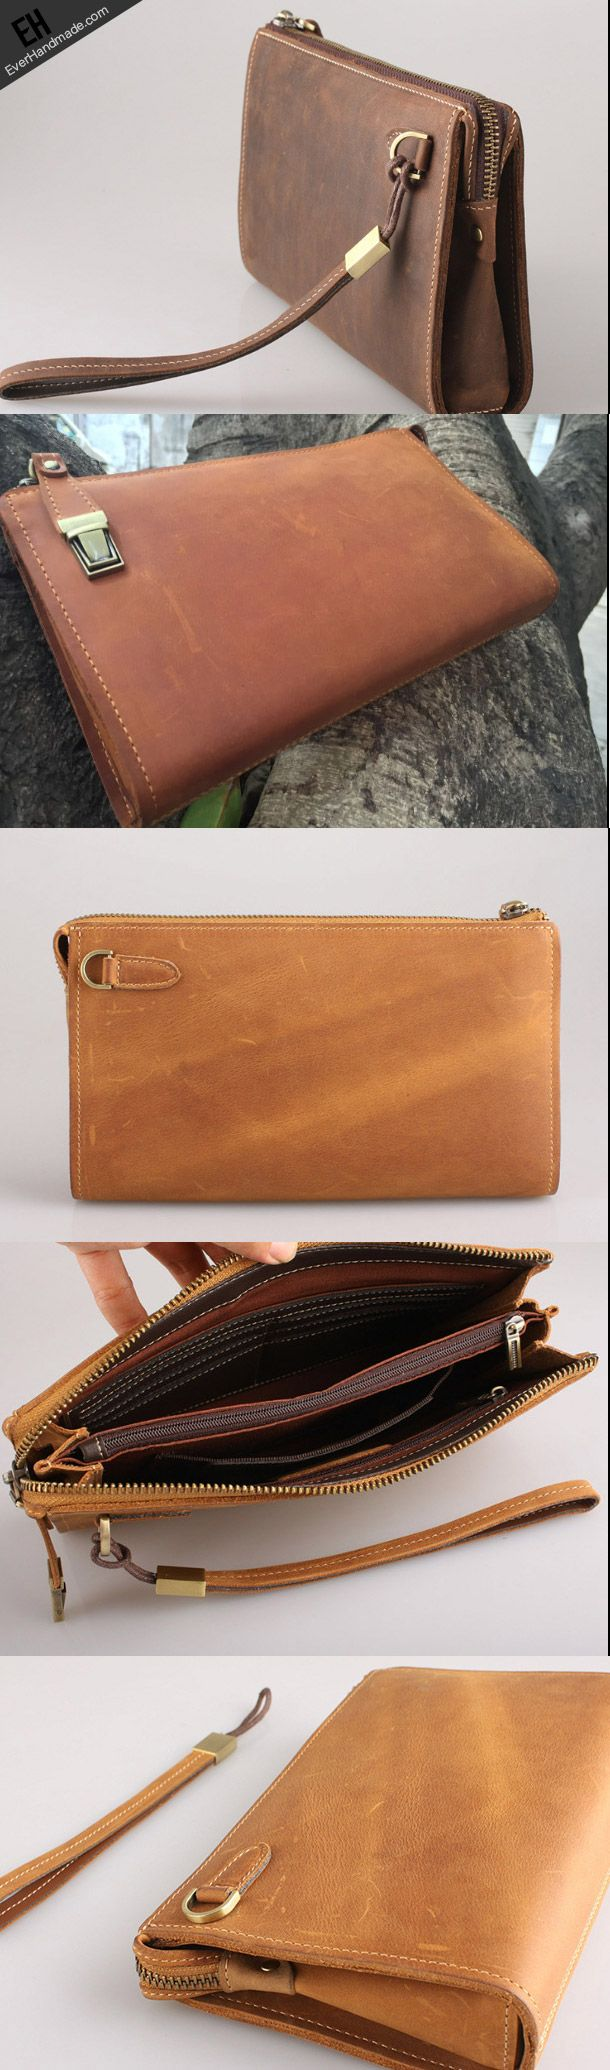 Handmade clutch long wallet leather men phone clutch vintage wallet for